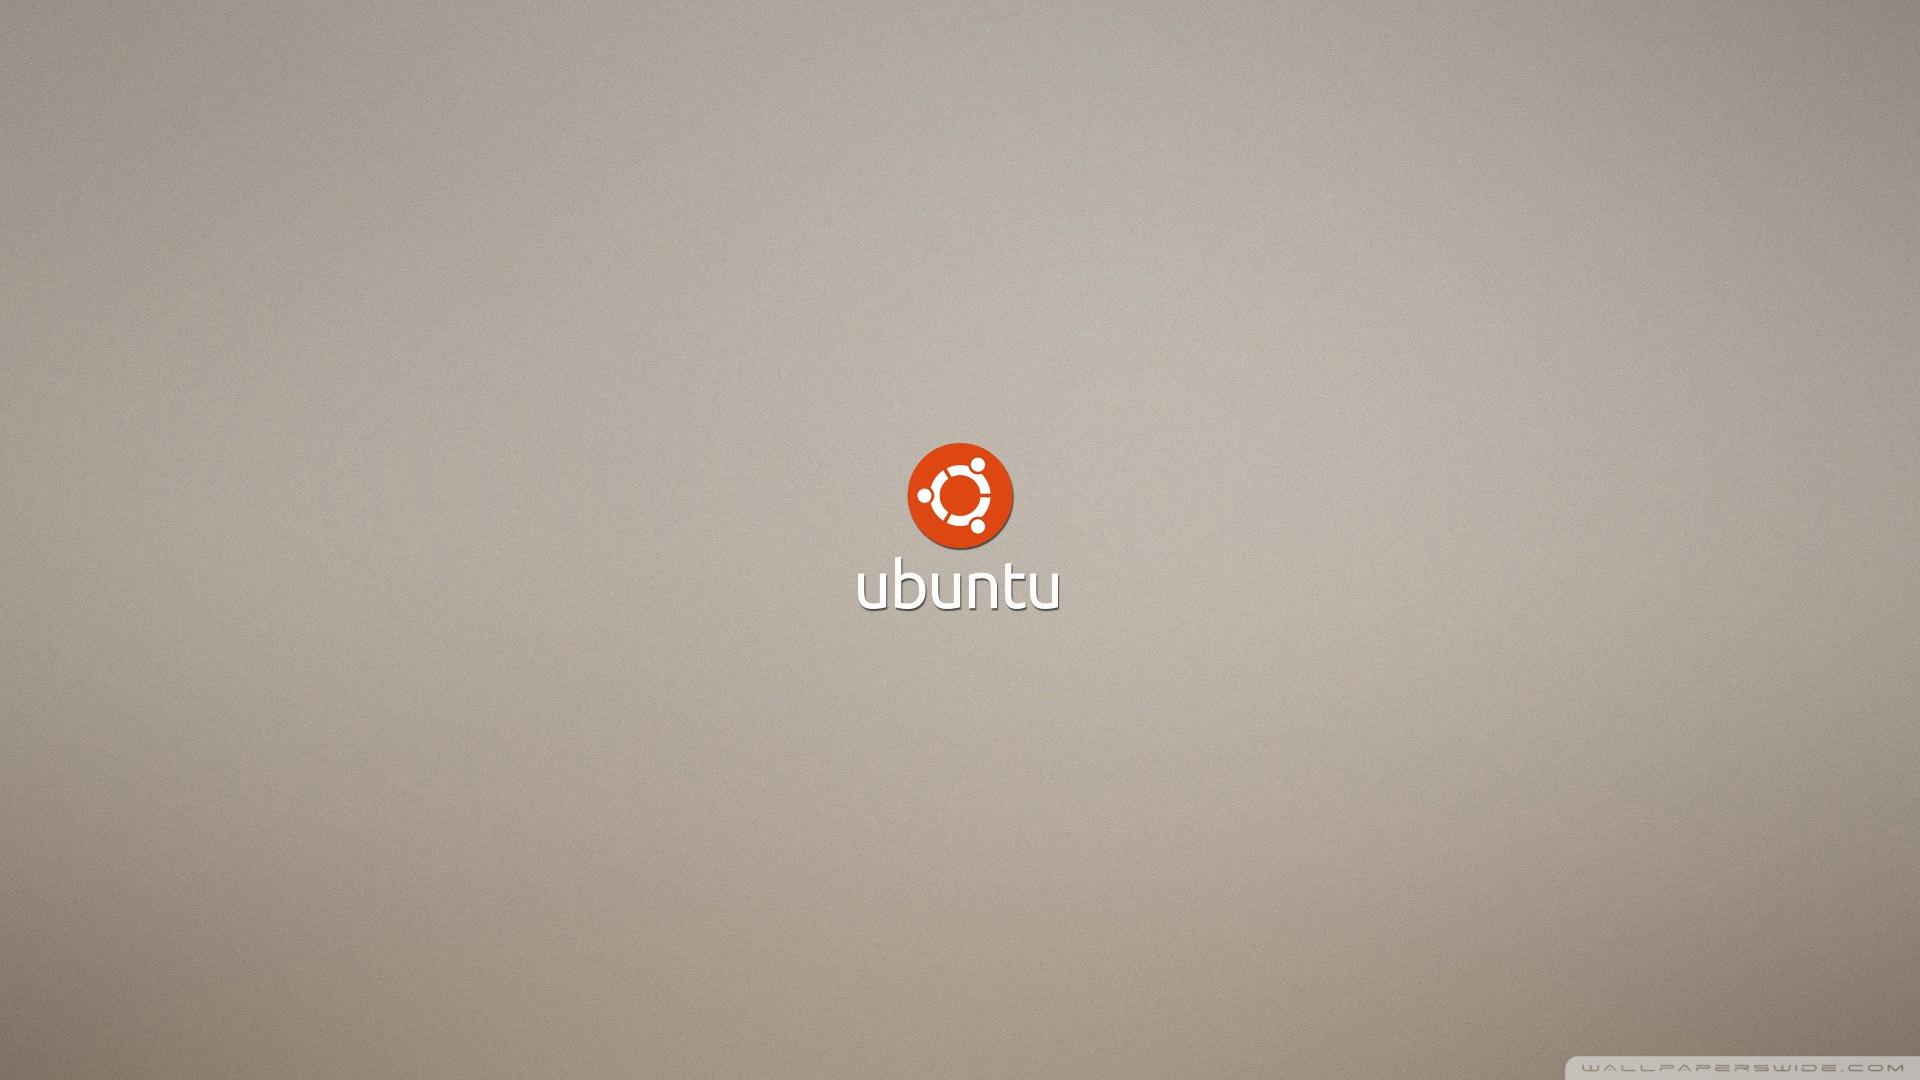 Ubuntu Desktop Plomo Wallpaper 1920x1080 Ubuntu Desktop Plomo 1920x1080